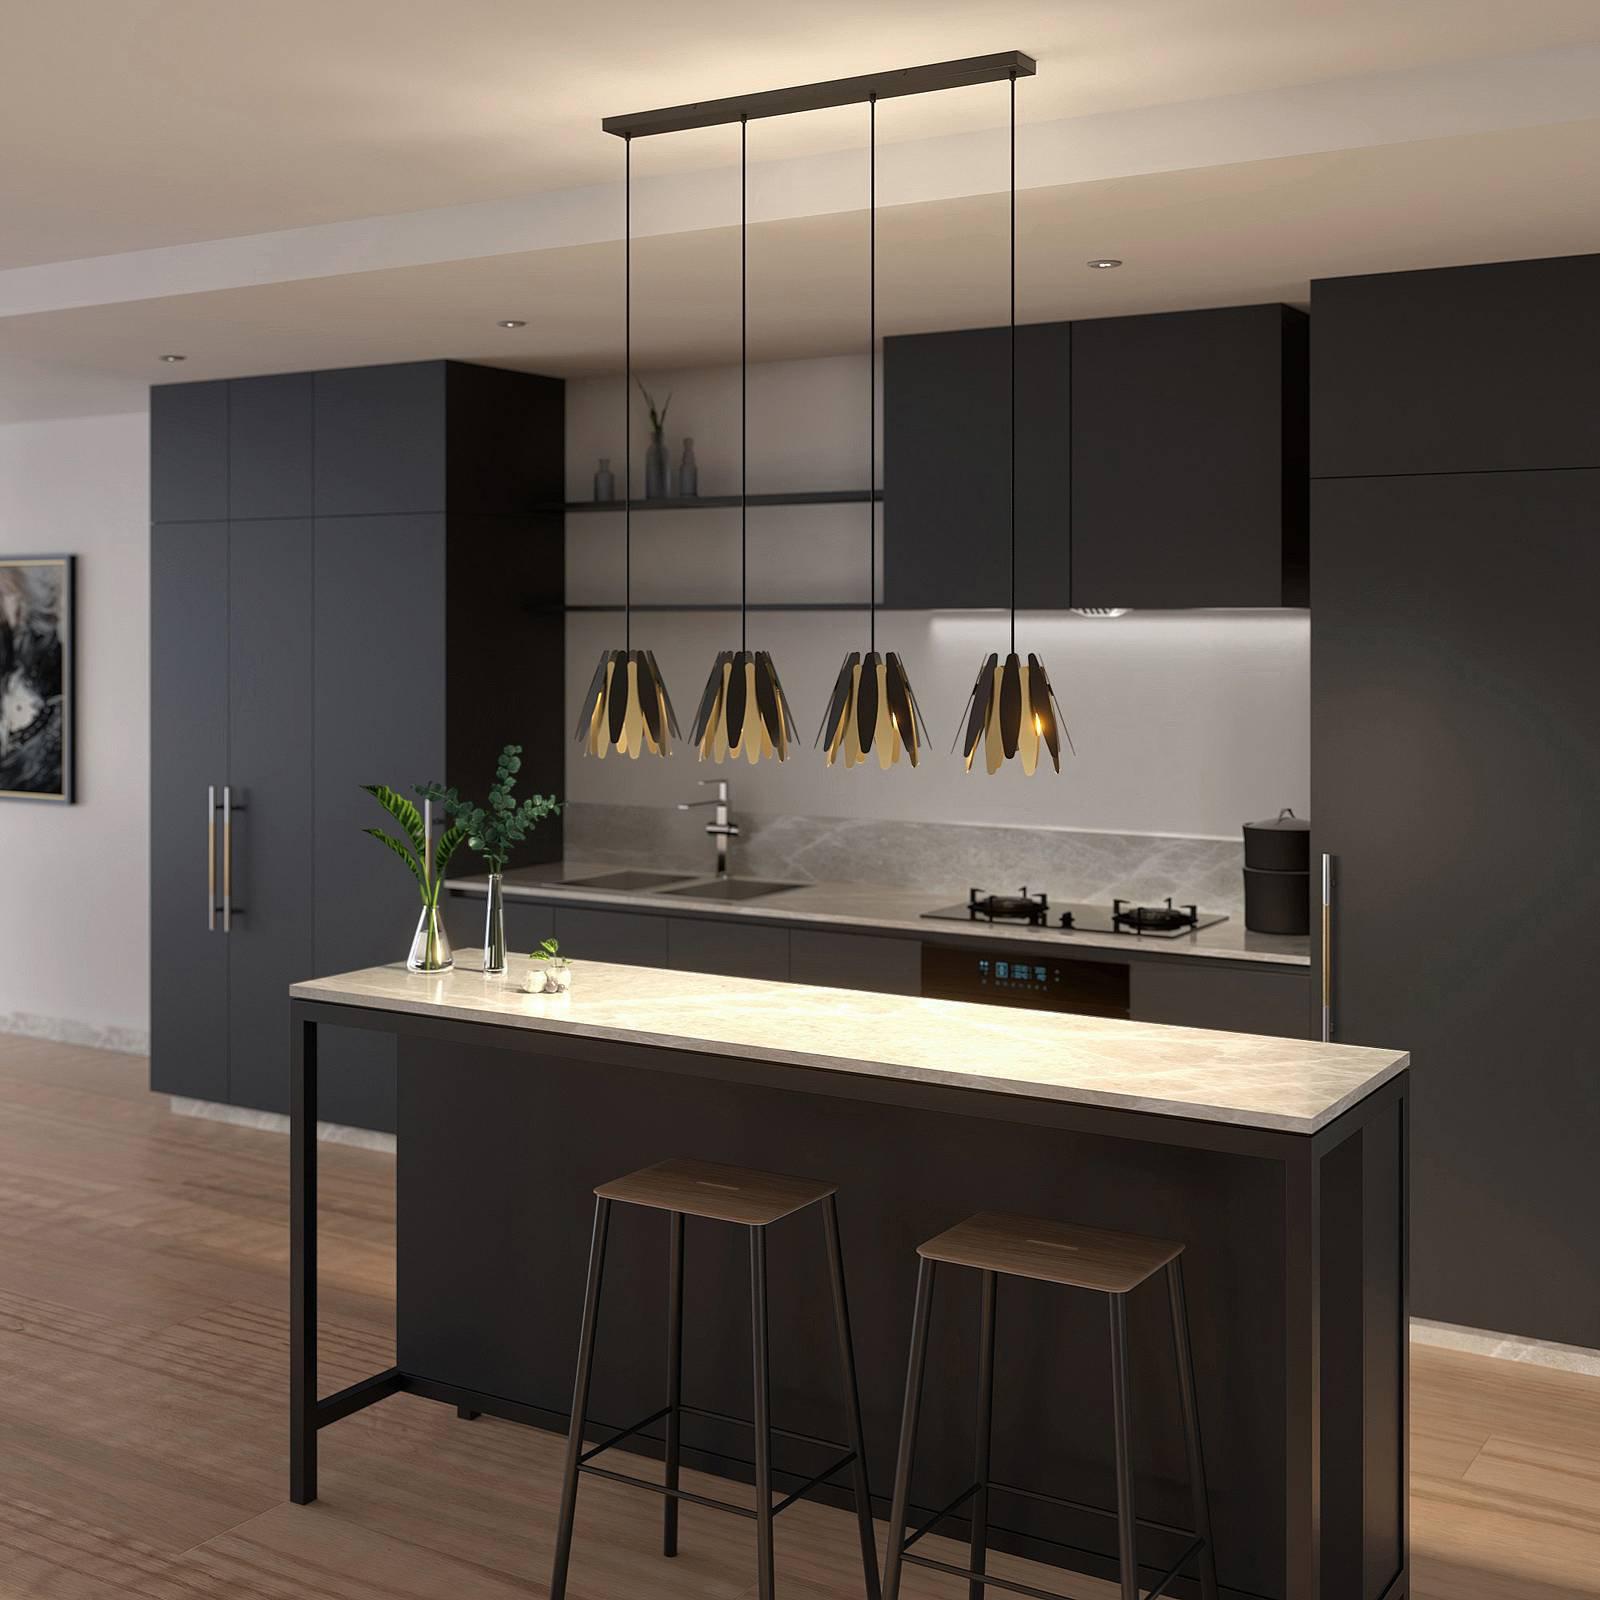 Lucande Lounit hengelampe, svart-gull, 4 lyskilde